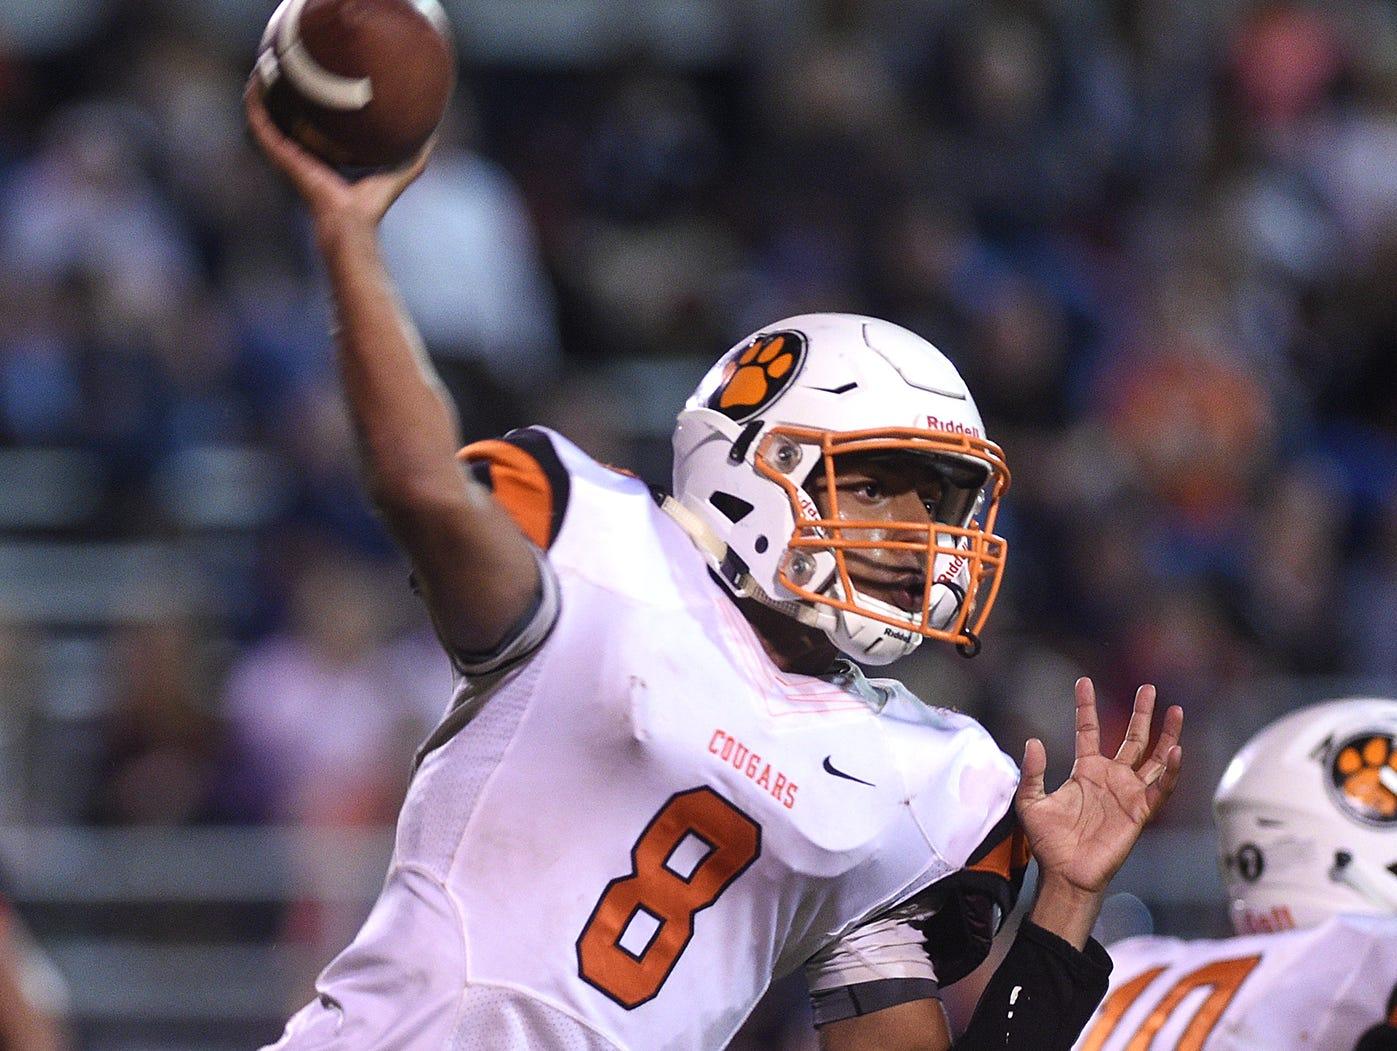 Middle Tennessee Christian quarterback Joseph Peck